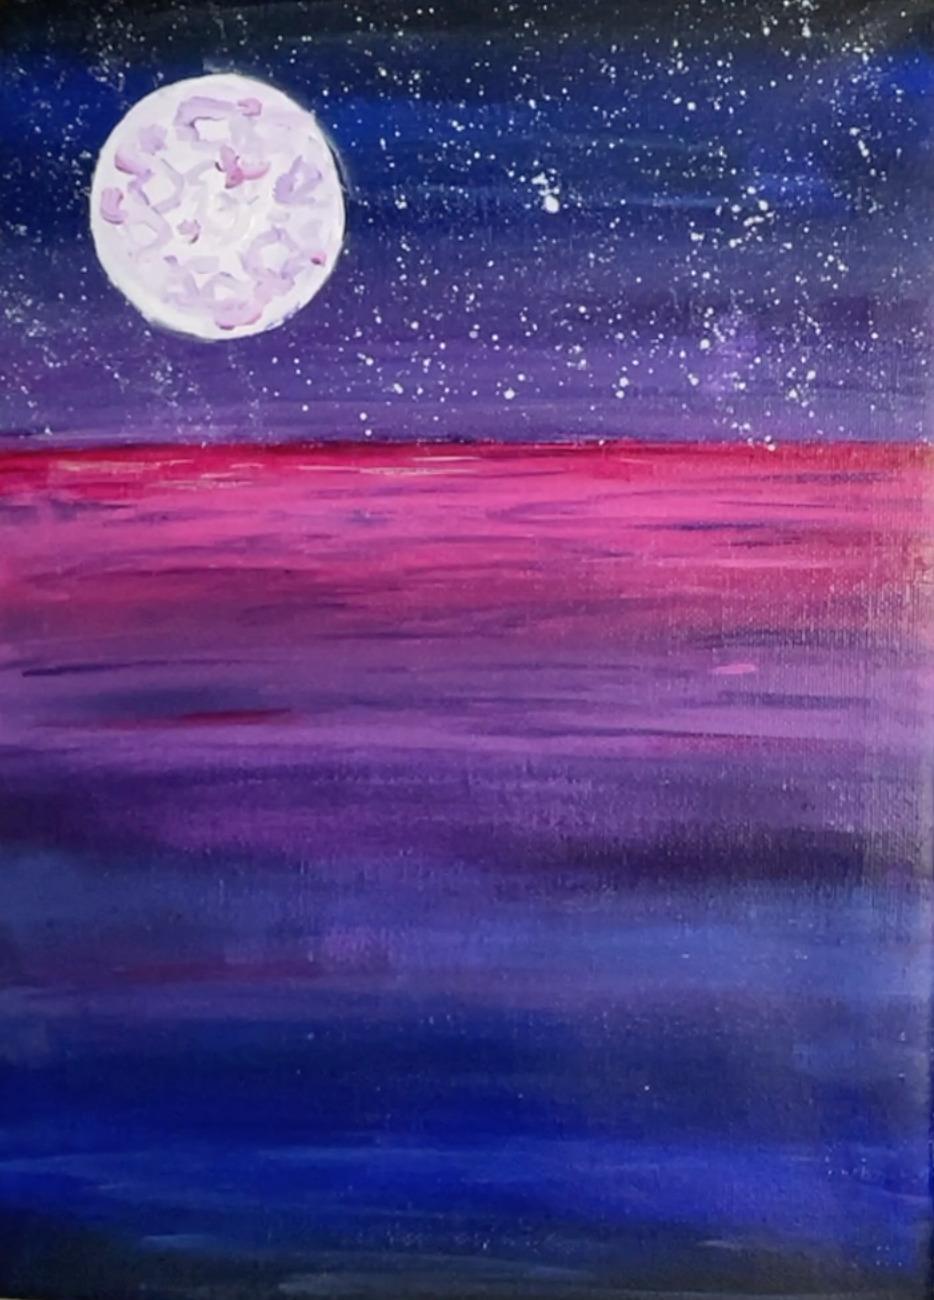 mermaid painting moon 2